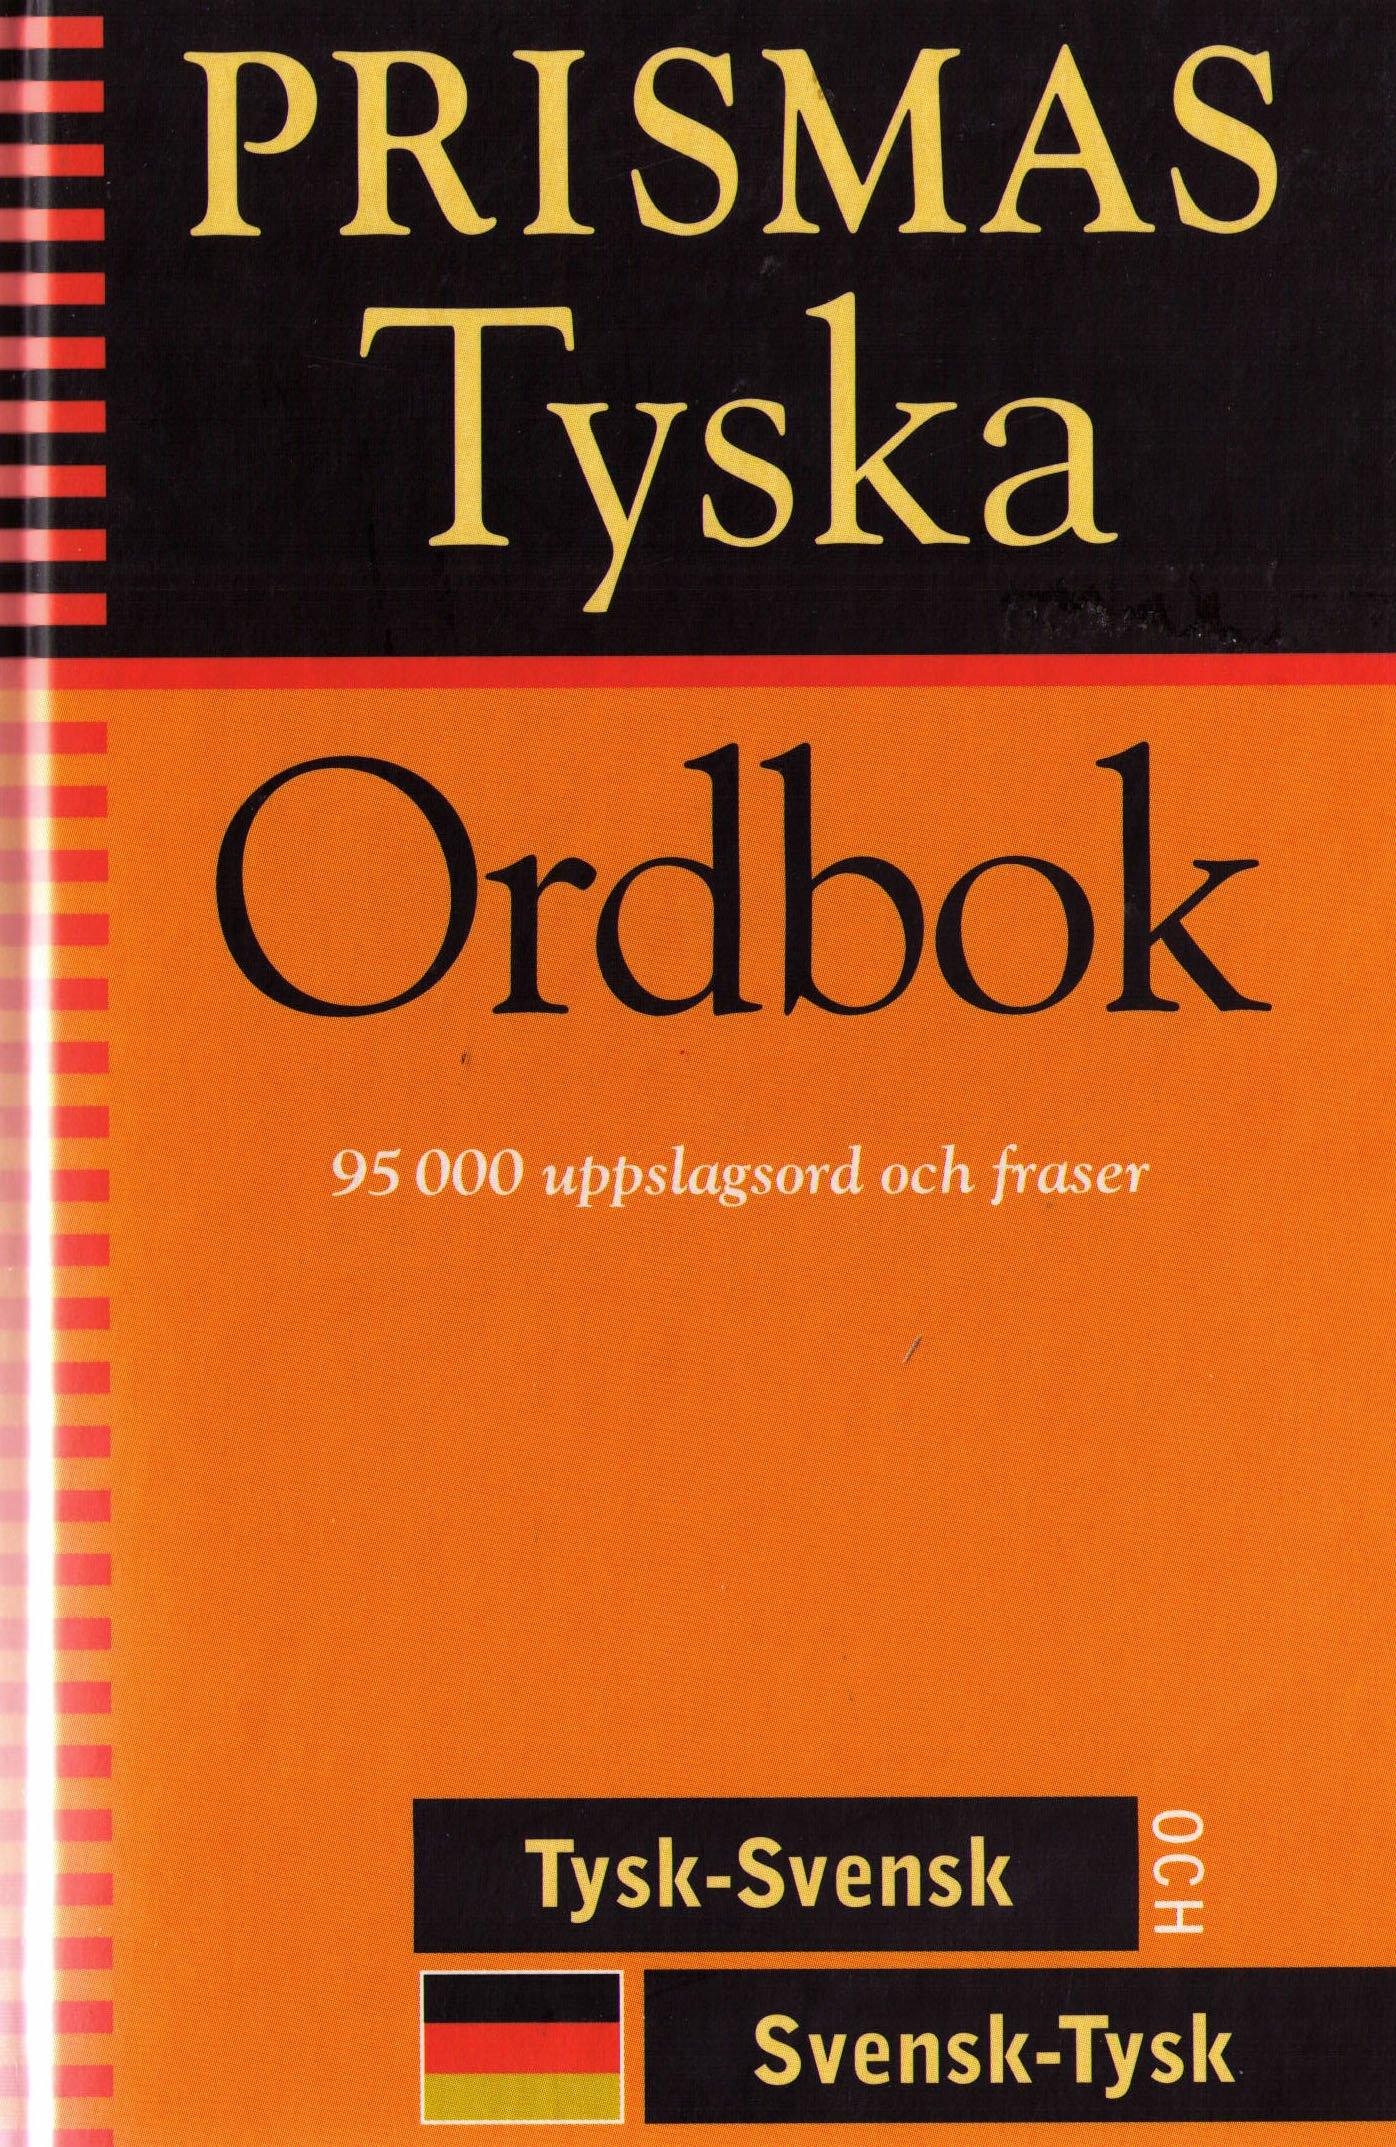 Prismas tyska ordbok : tysk-svensk, svensk-tysk, grammatik